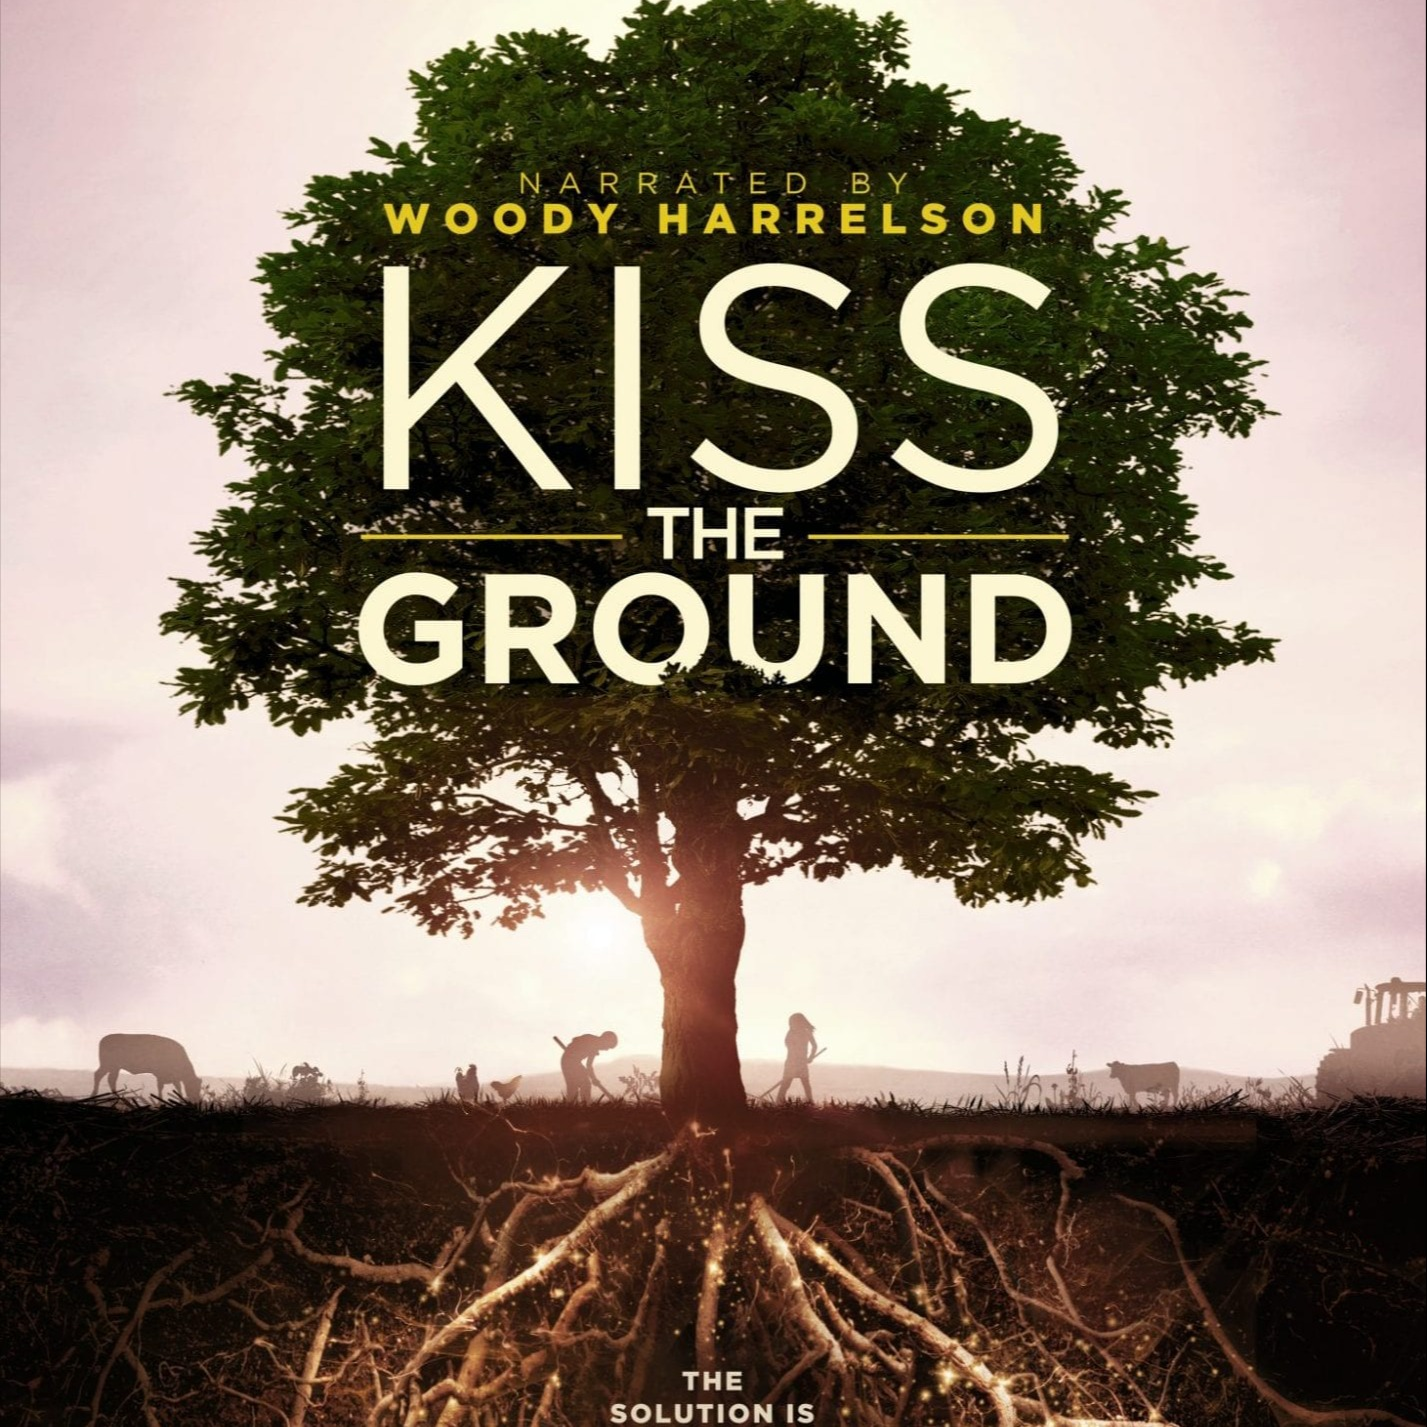 #tlugreenmonth2021 10.04.2021: Movie Screening - Kiss the Ground  Link Thumbnail | Linktree